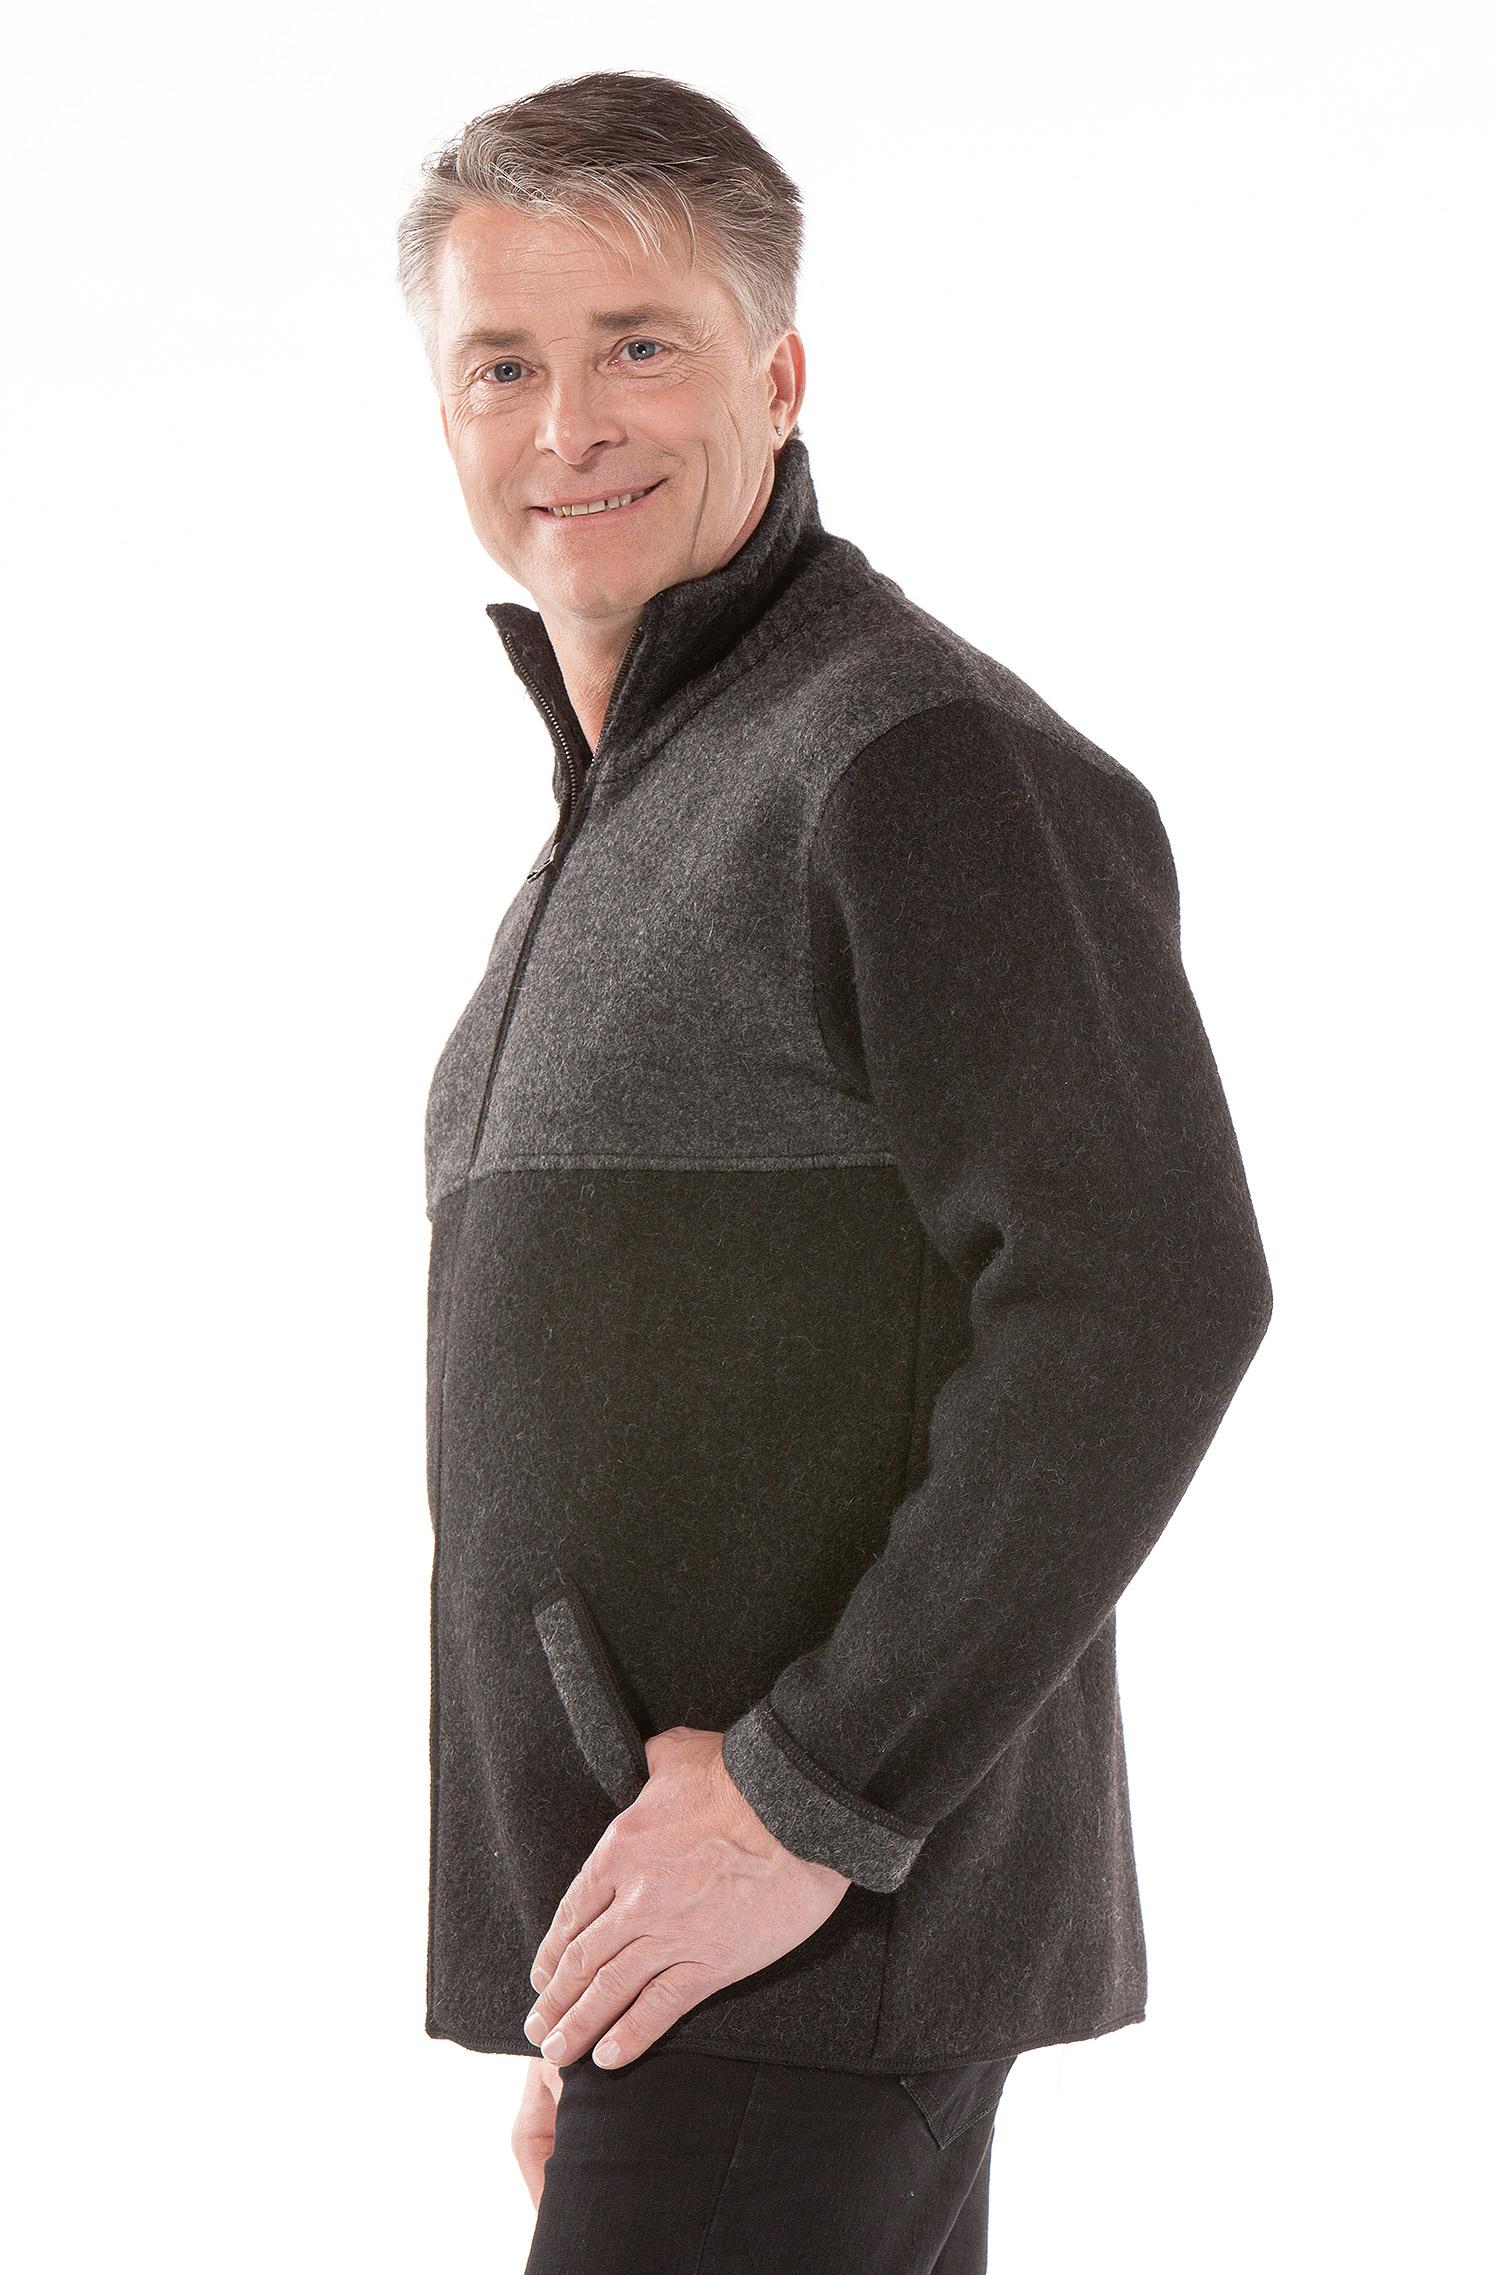 Hedendaags Gevilte heren vestjas grijs - Alpaca Fashion HM-29